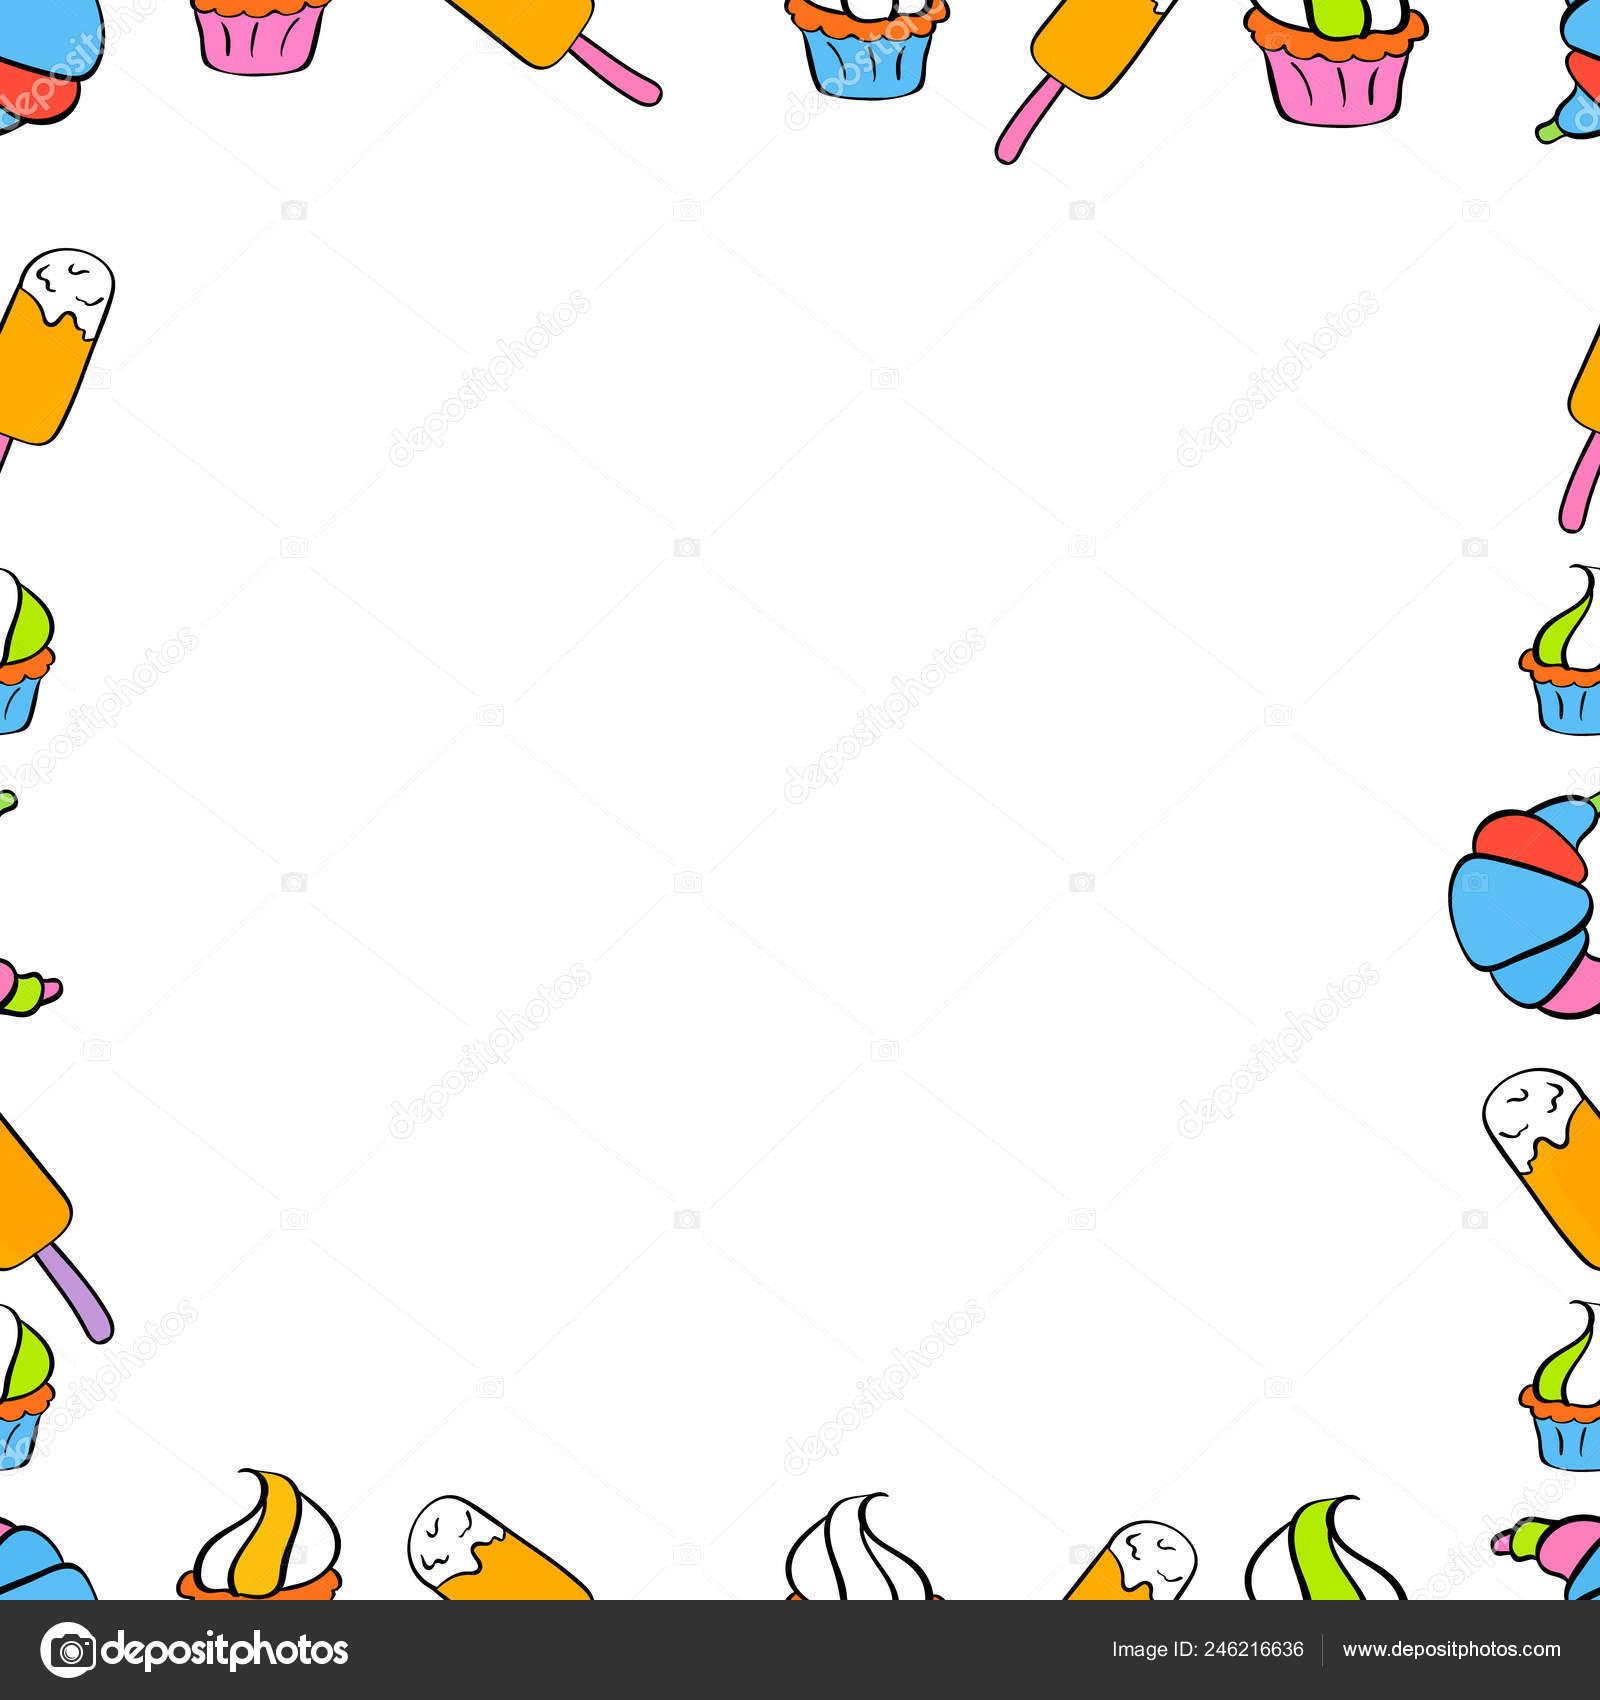 Vector Illustration Border Design Pattern Doodles Art Style Illustration White Stock Vector C Valera197615 246216636